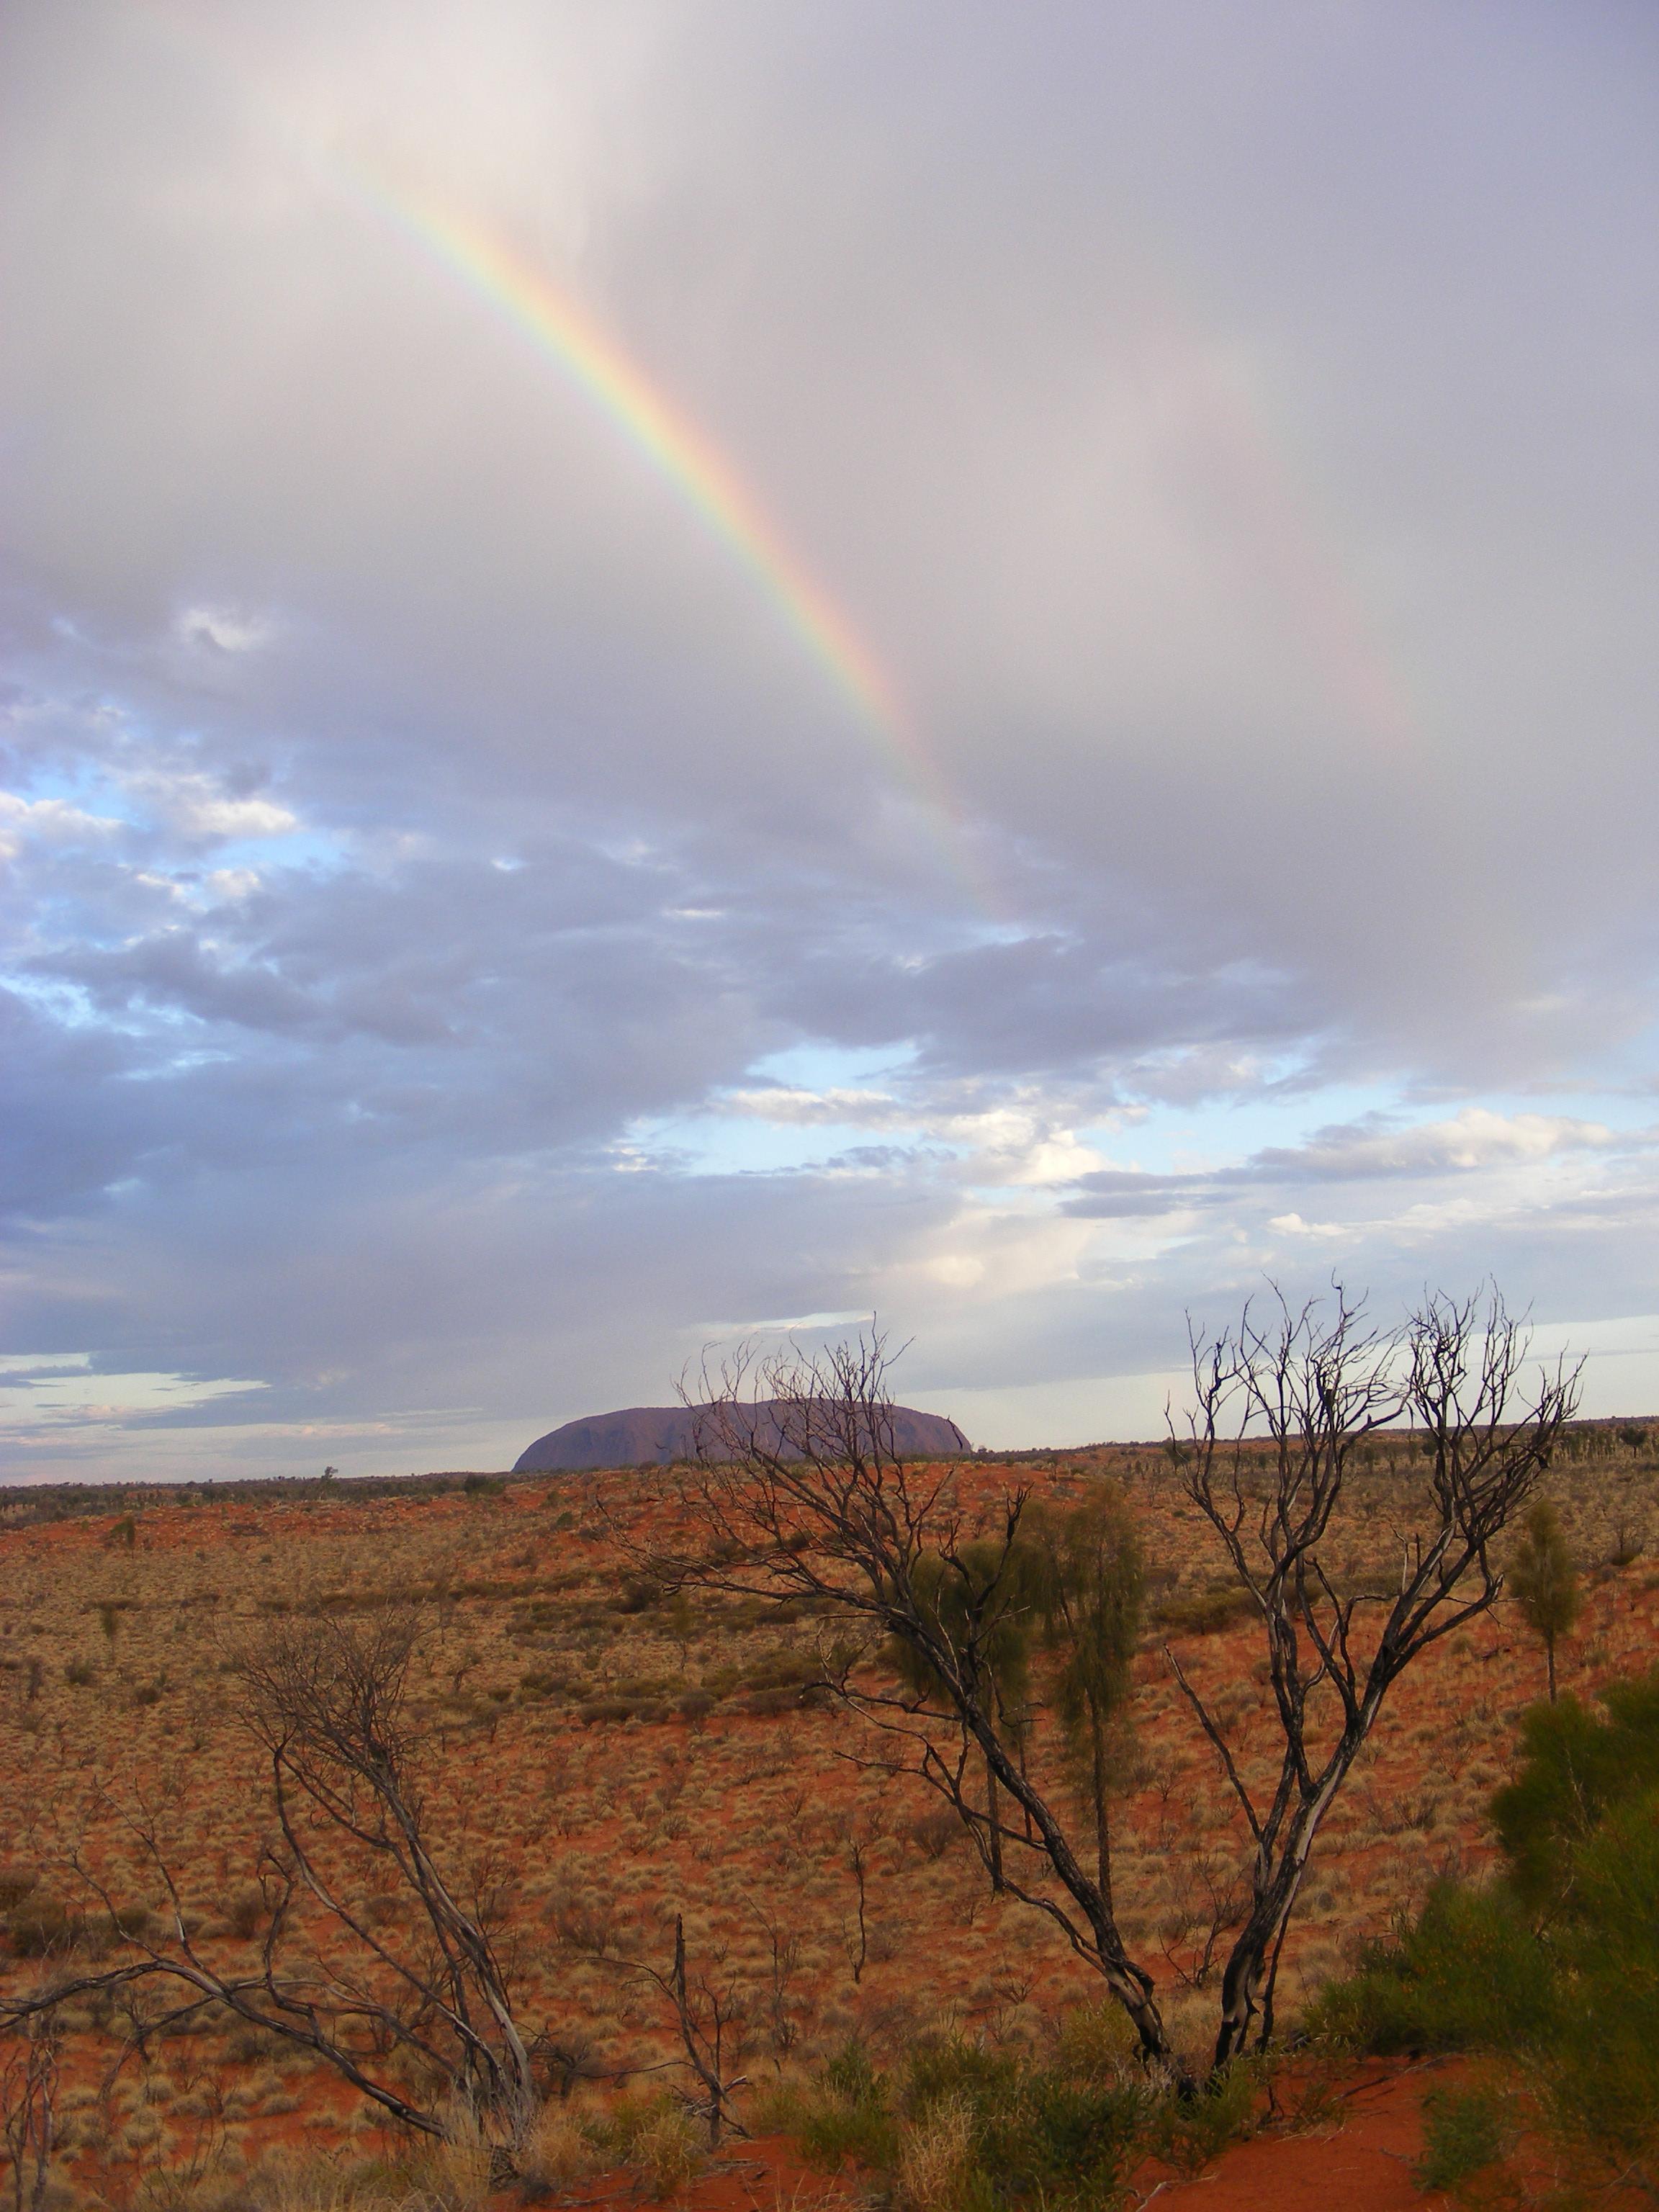 Rainbow over Ayers Rock